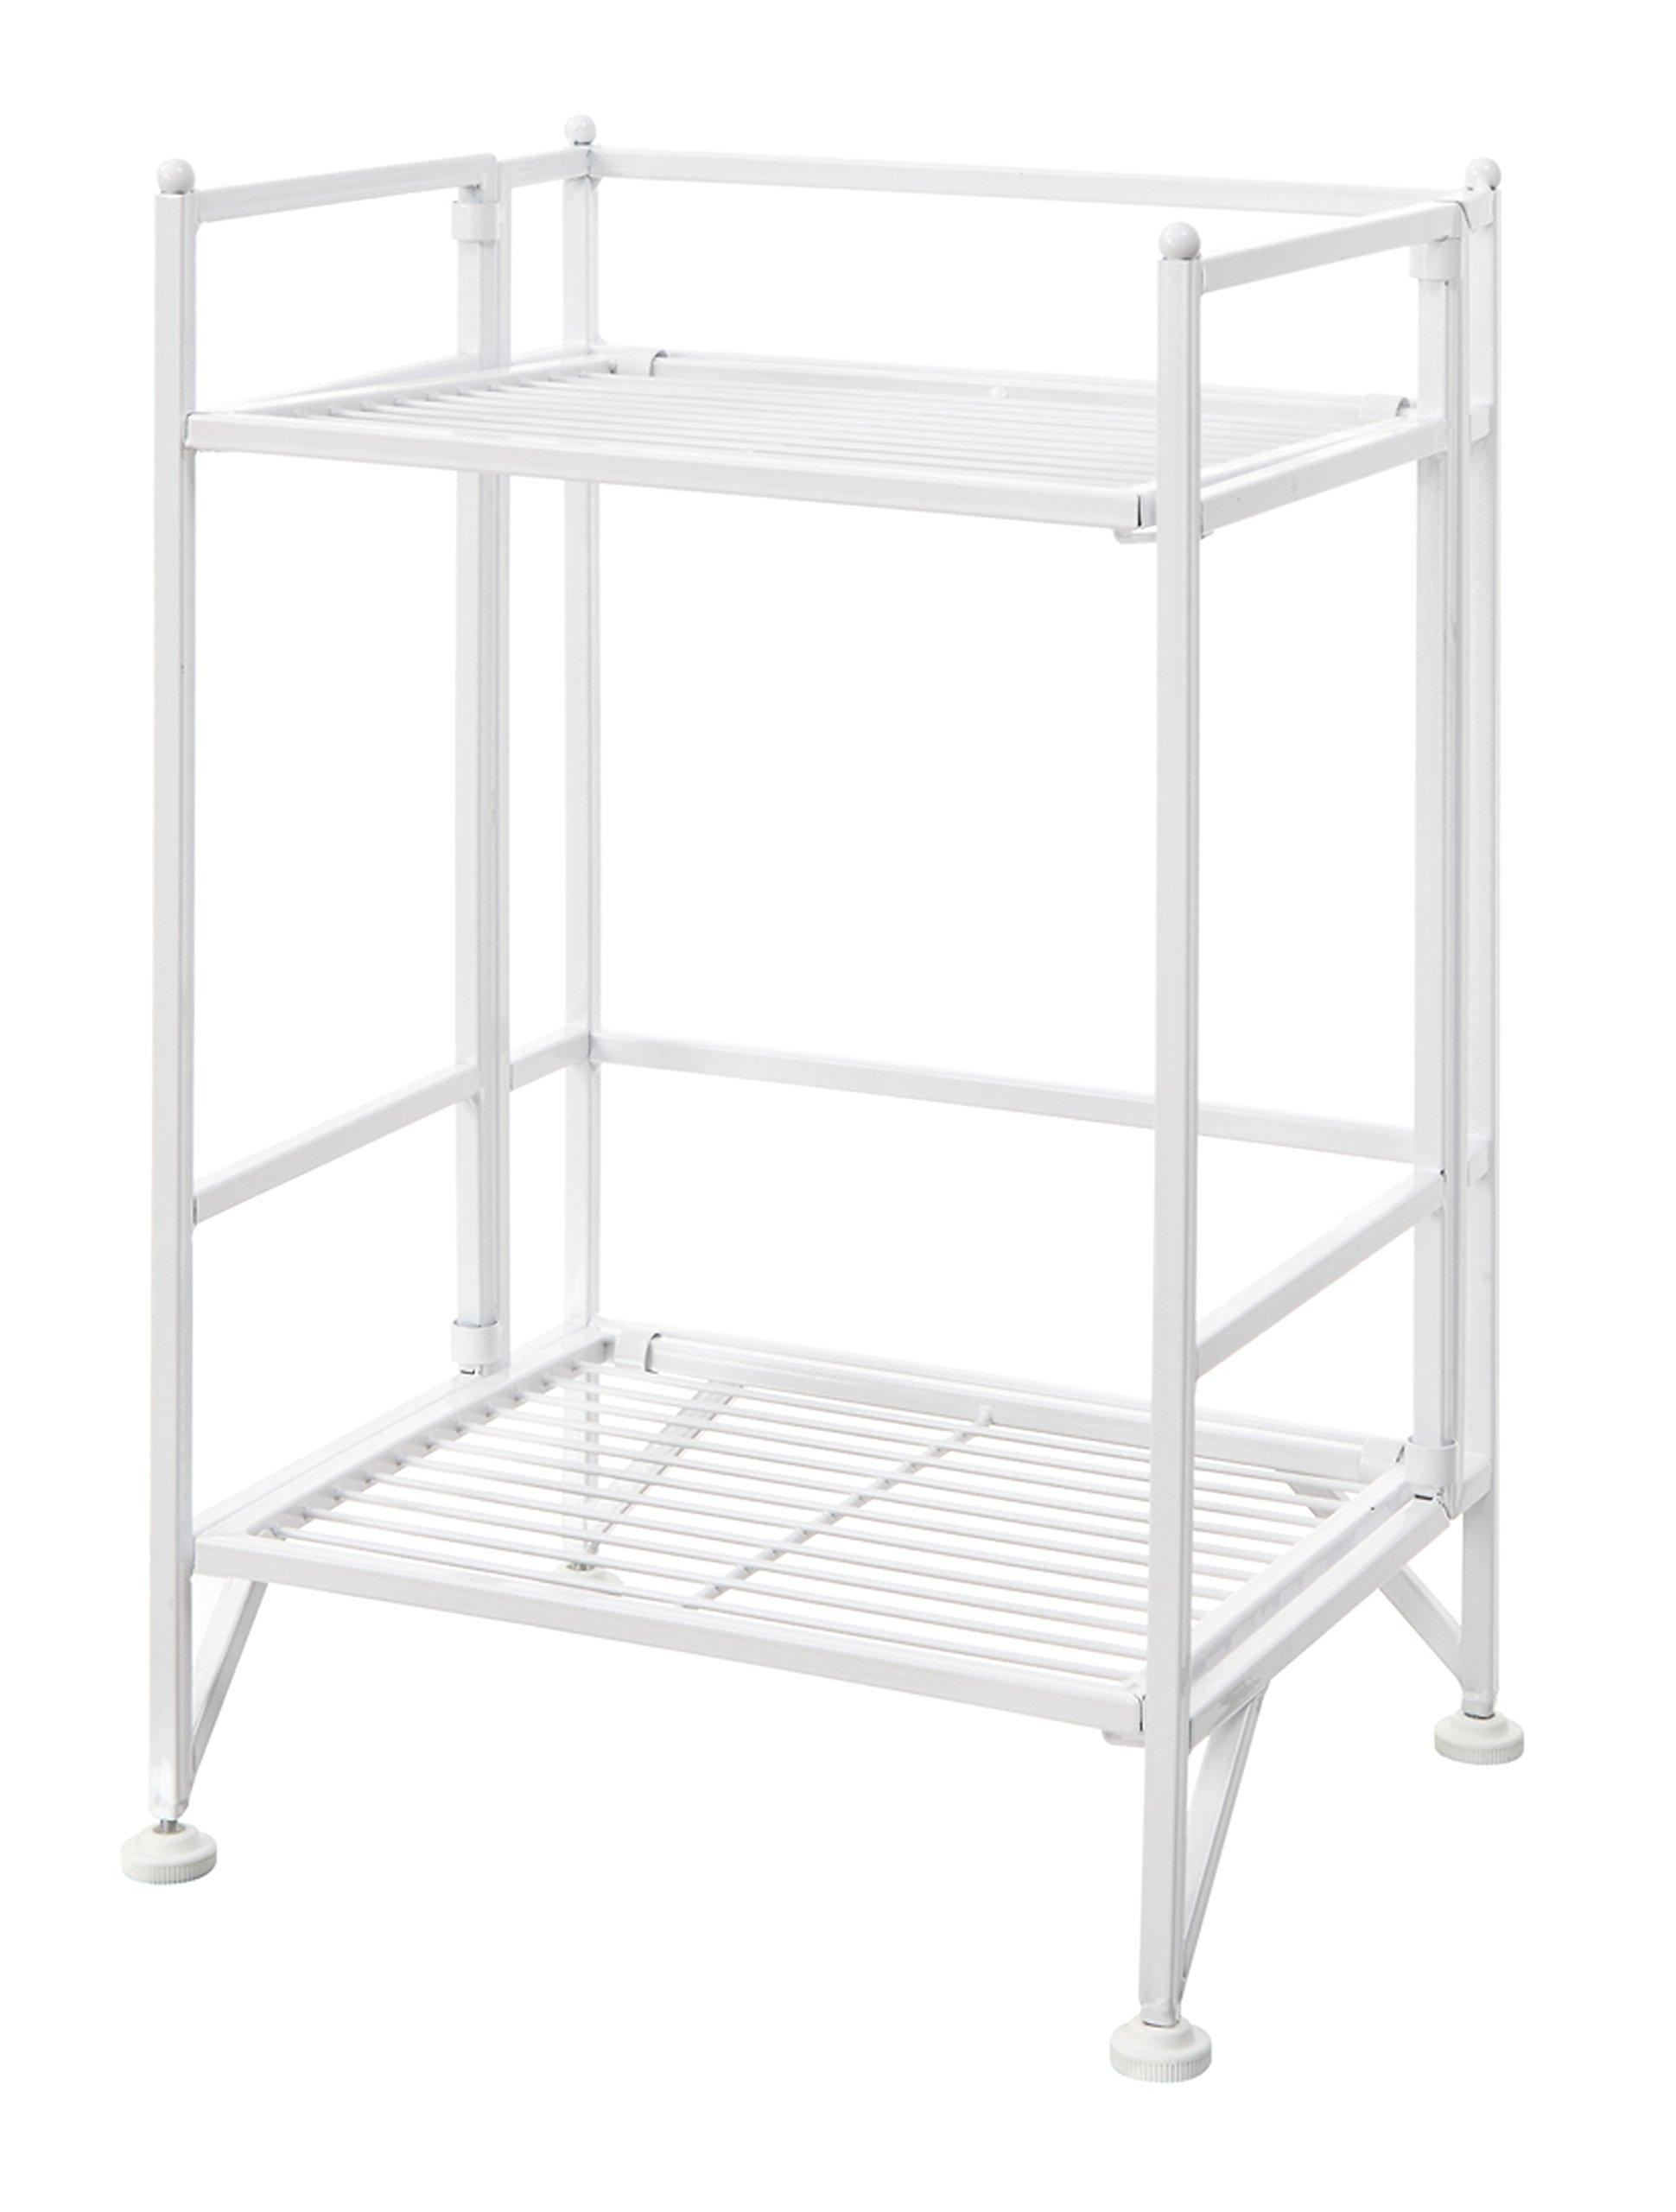 Convenience Concepts Designs2Go X-Tra Storage 2-Tier Folding Metal Shelf, White by Convenience Concepts